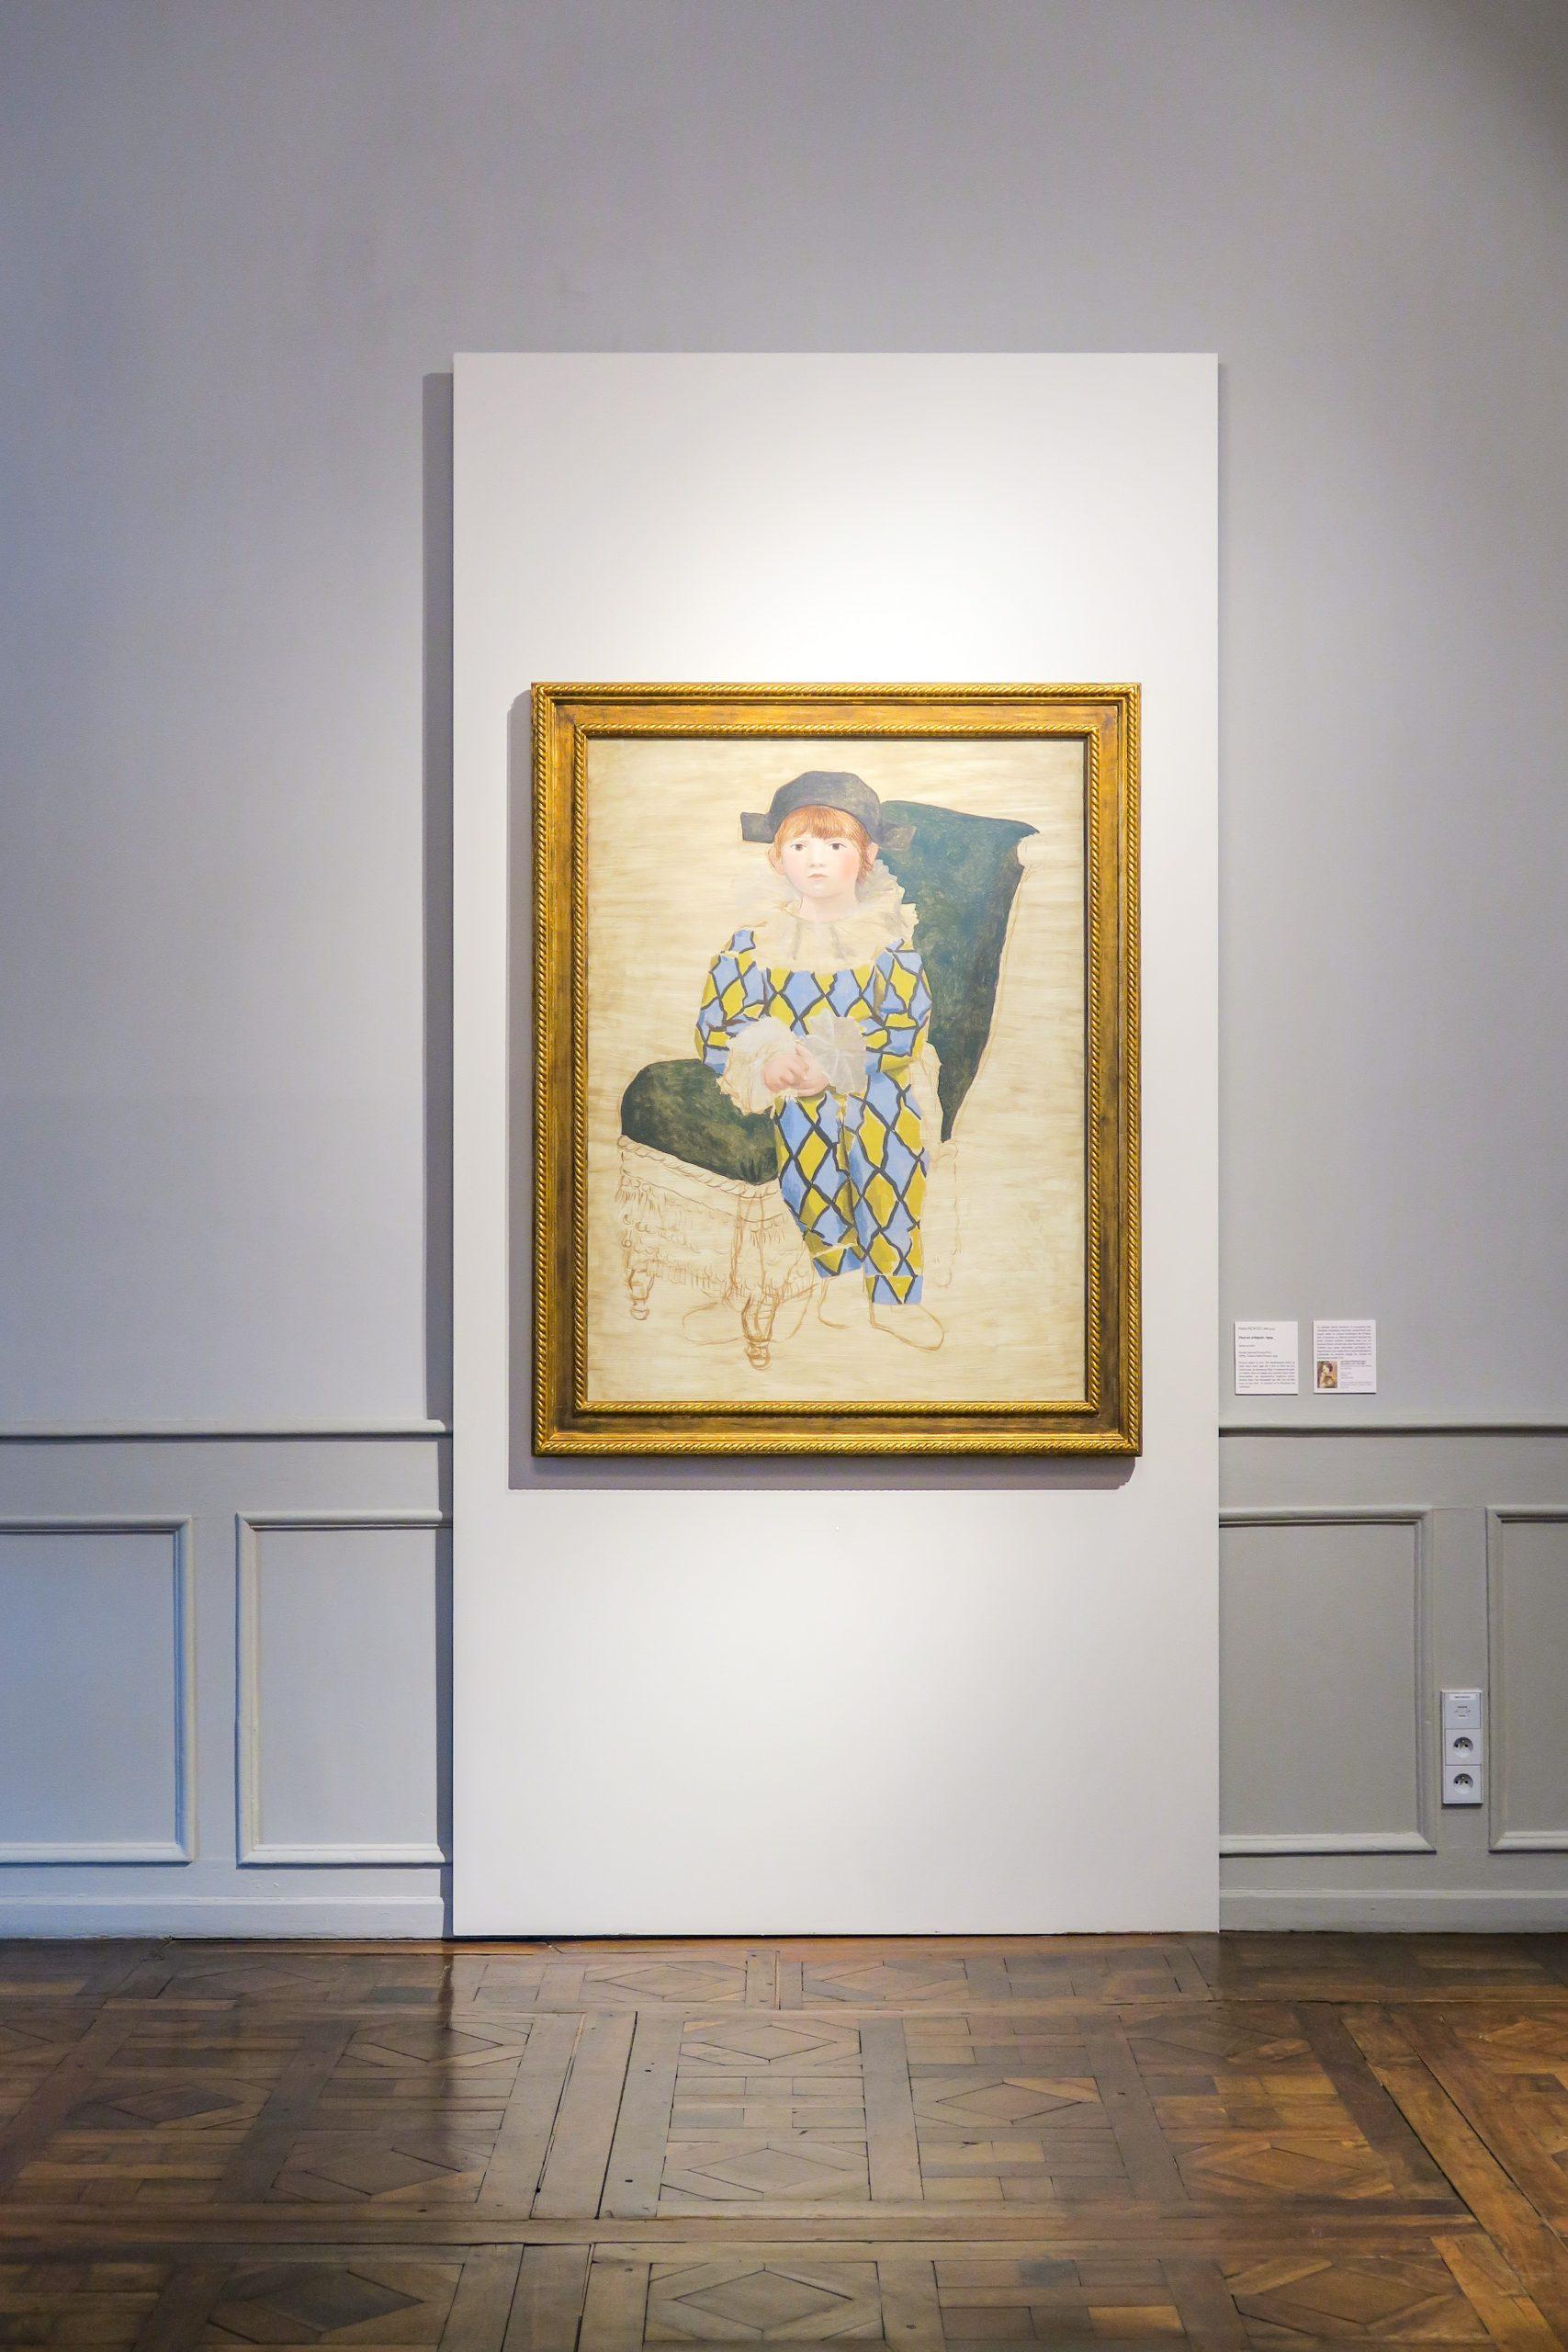 tableau picasso musée ingres bourdelle